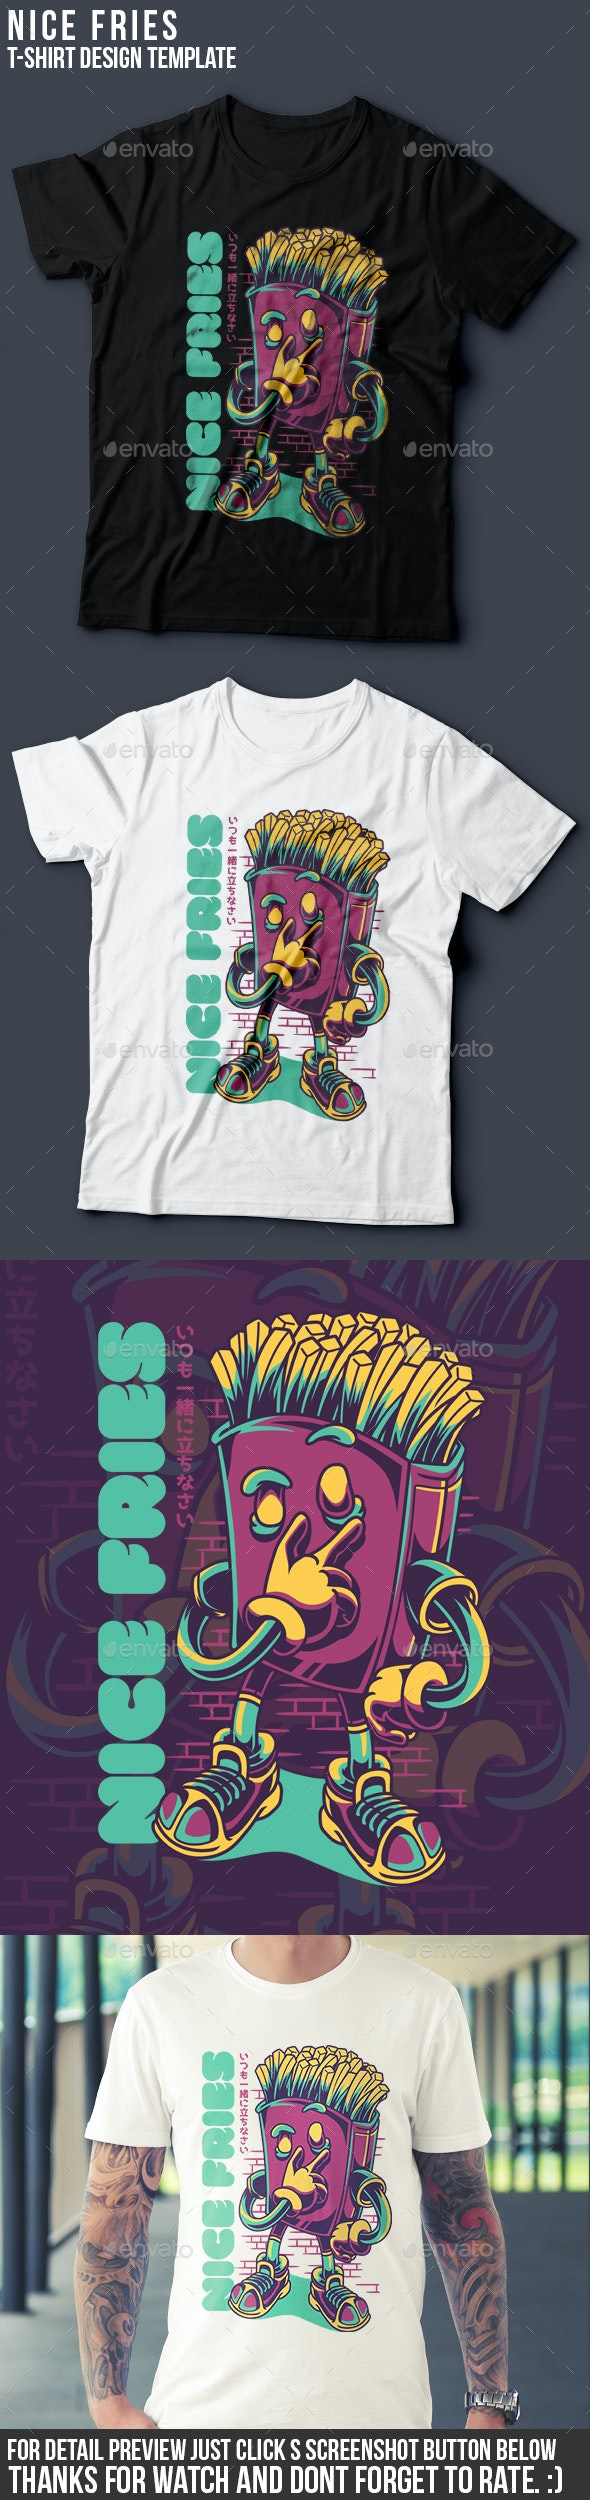 Nice Fries T-Shirt Design - Business T-Shirts